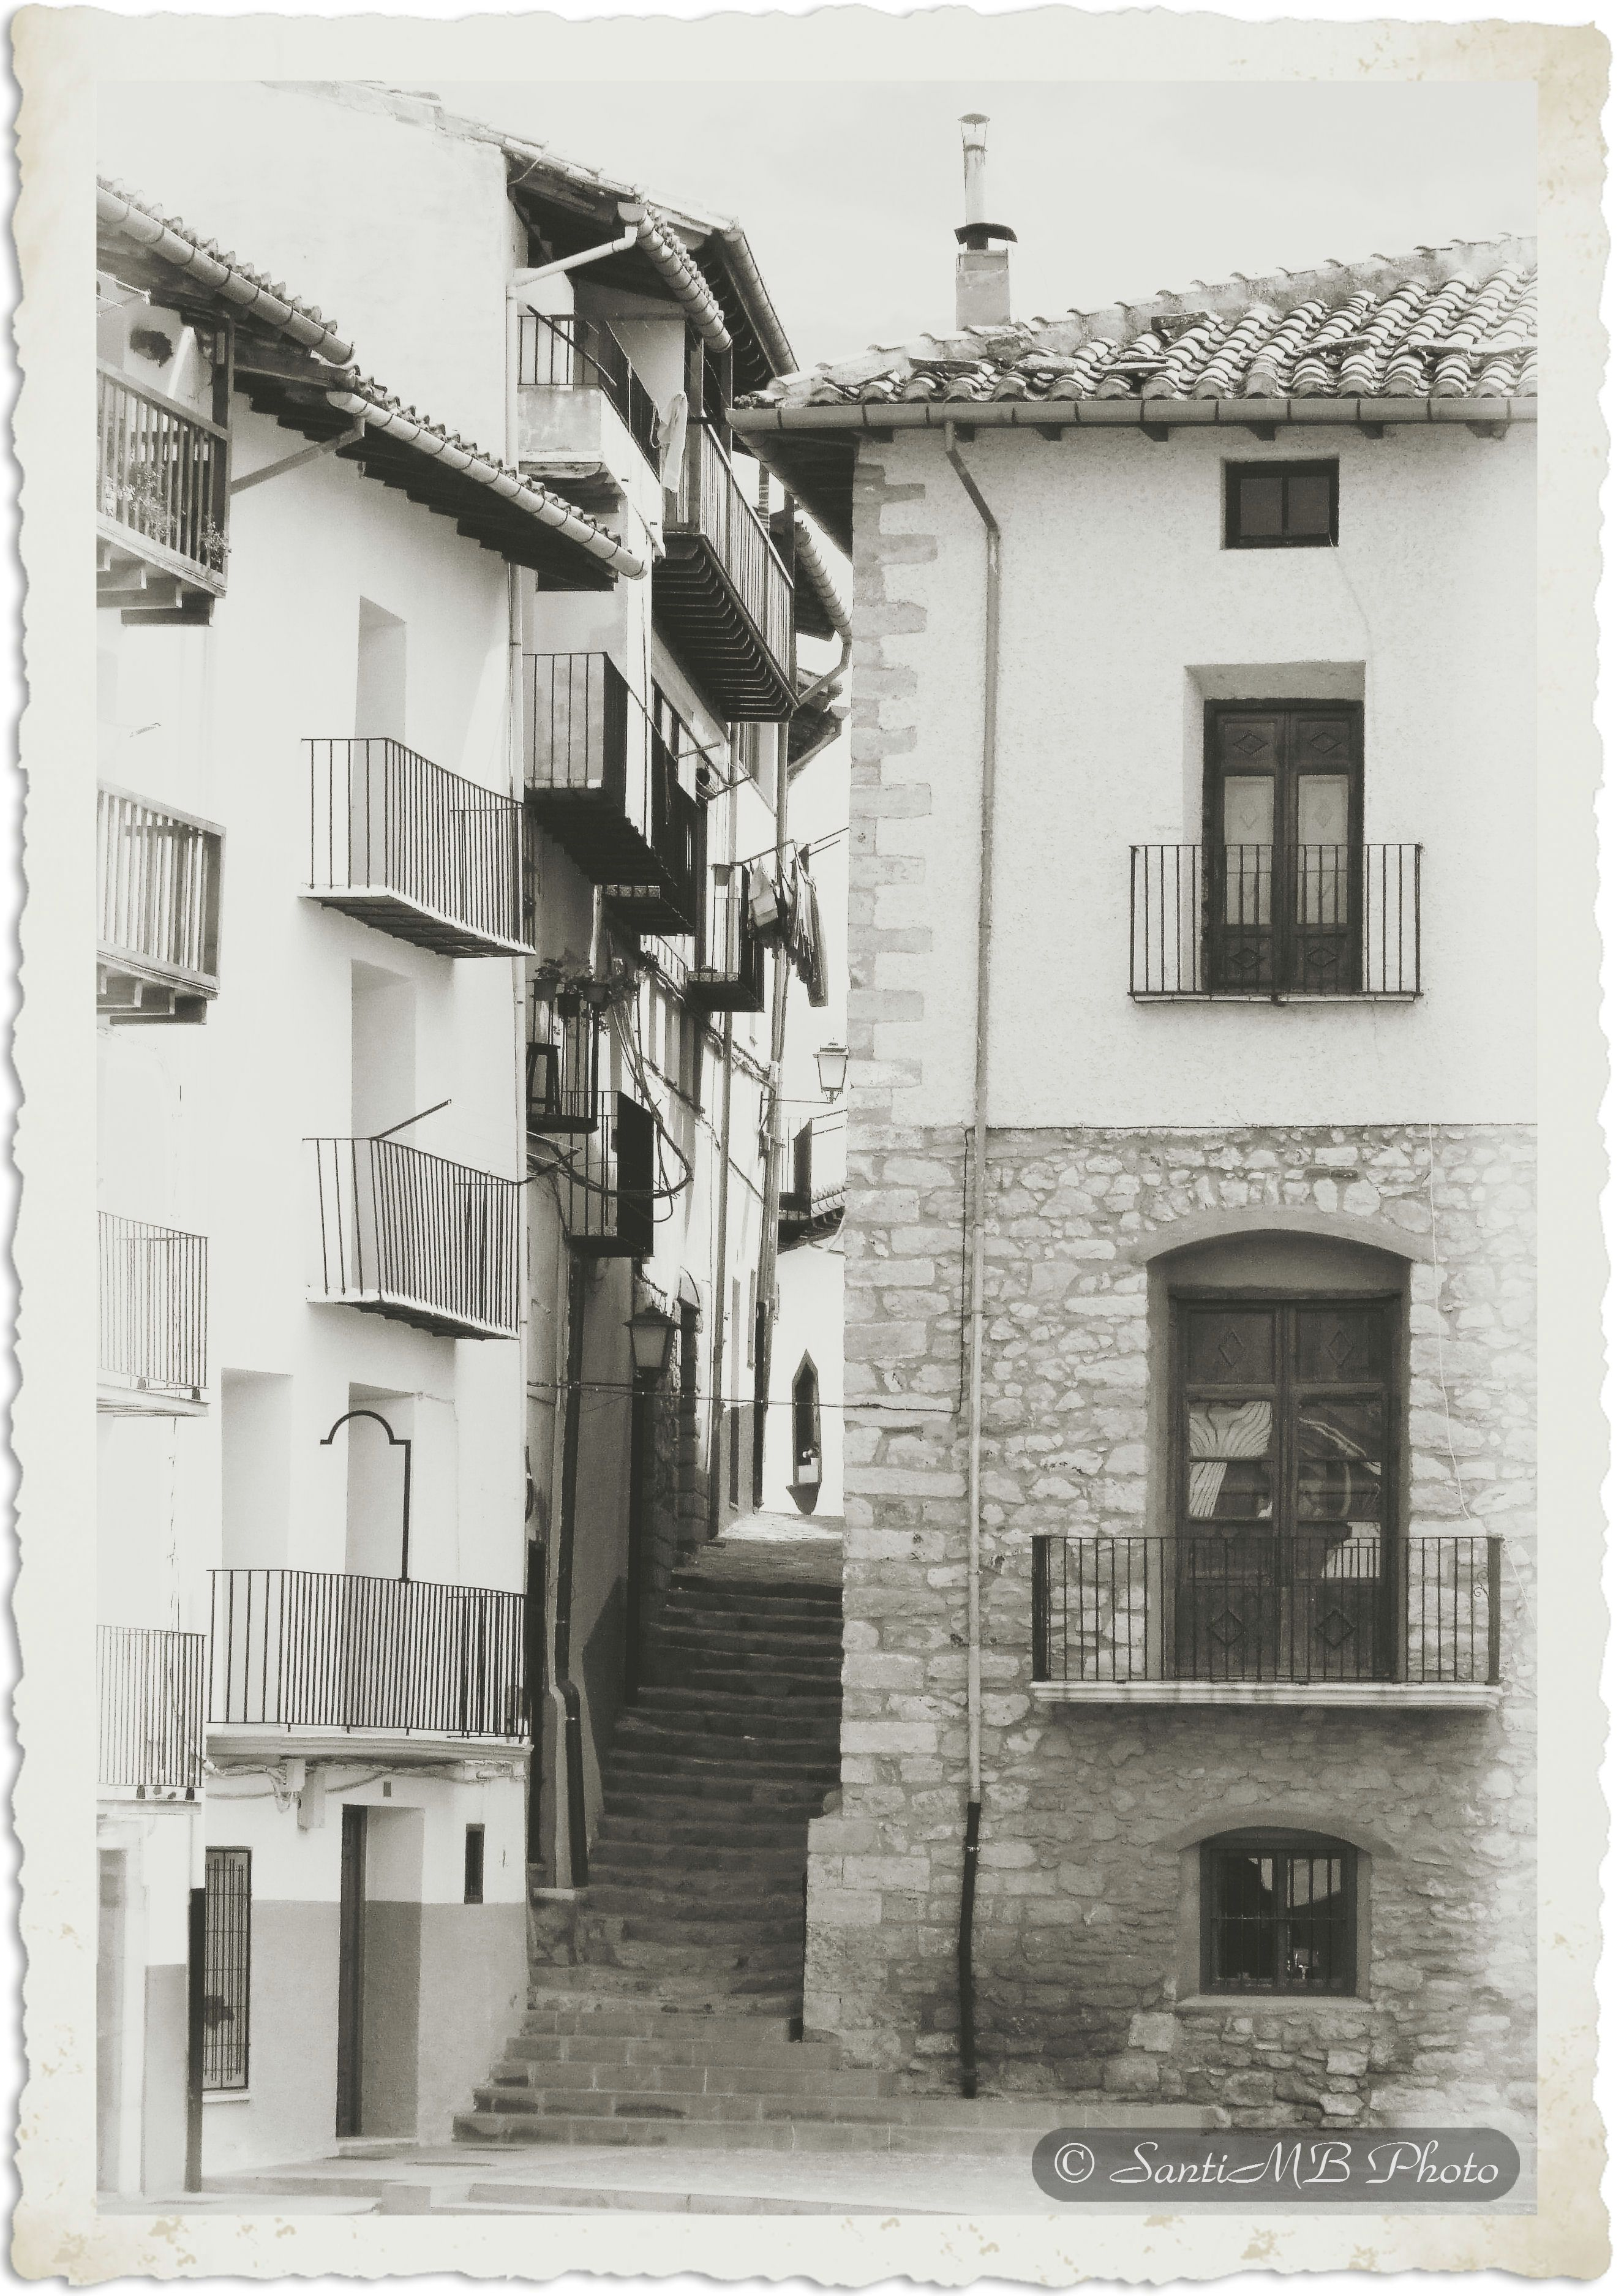 Elevation of masia noto 1 castell spain maplogs - Calle castello madrid ...